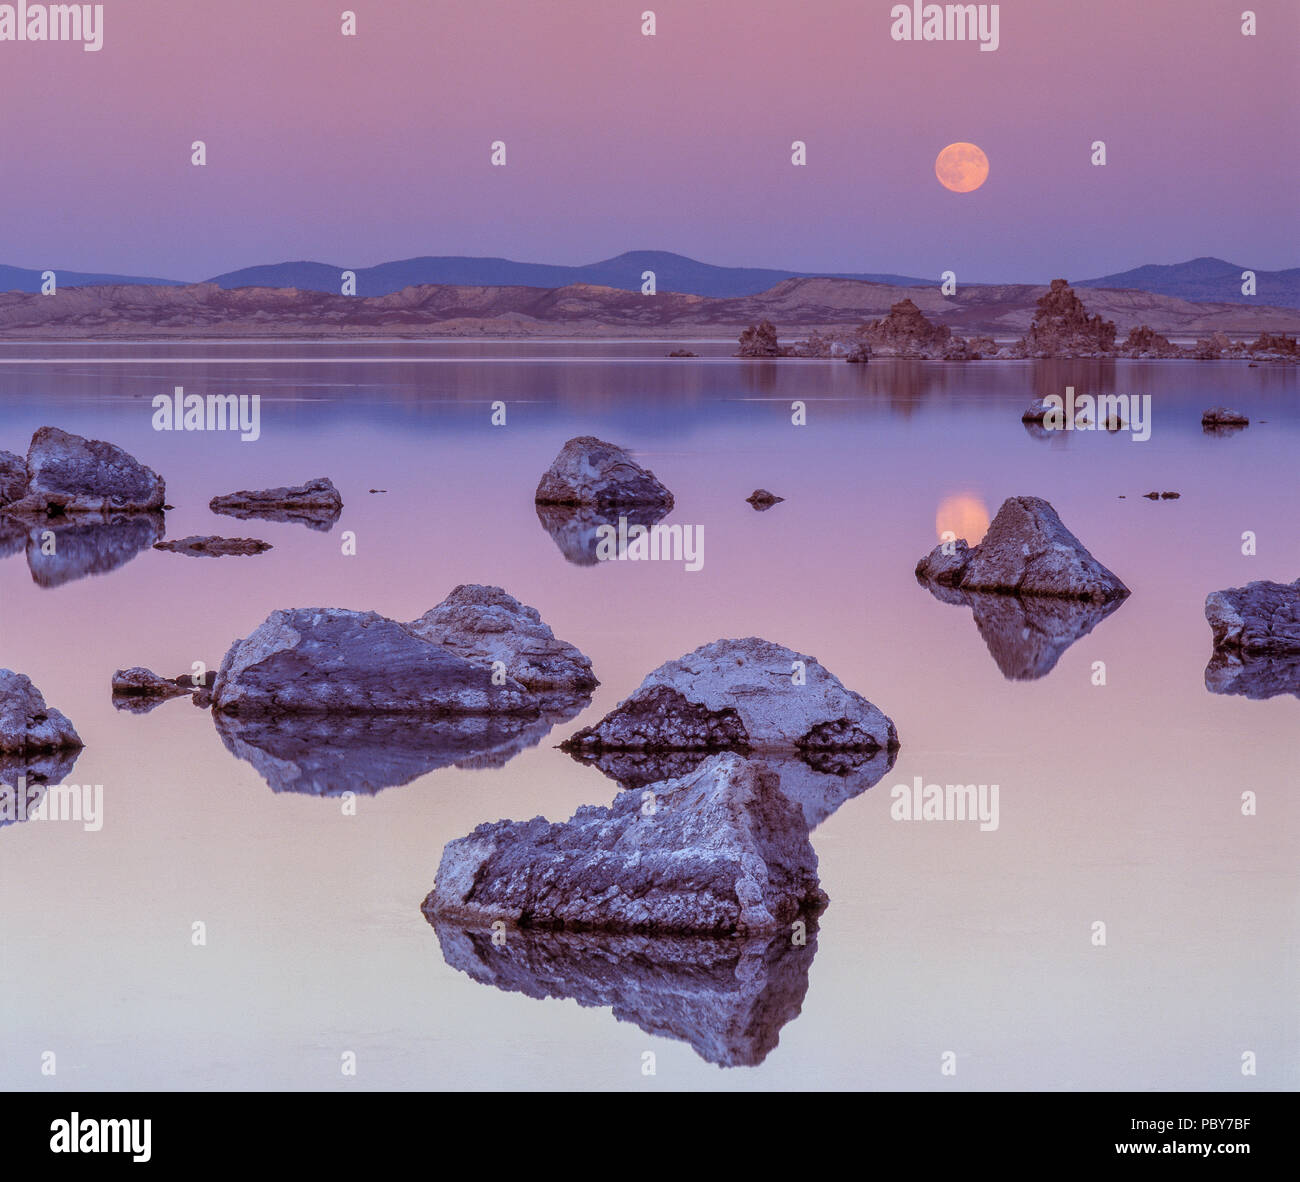 Moonrise, Mono Lake, Mono Basin National Forest Scenic Area, Inyo National Forest, California - Stock Image